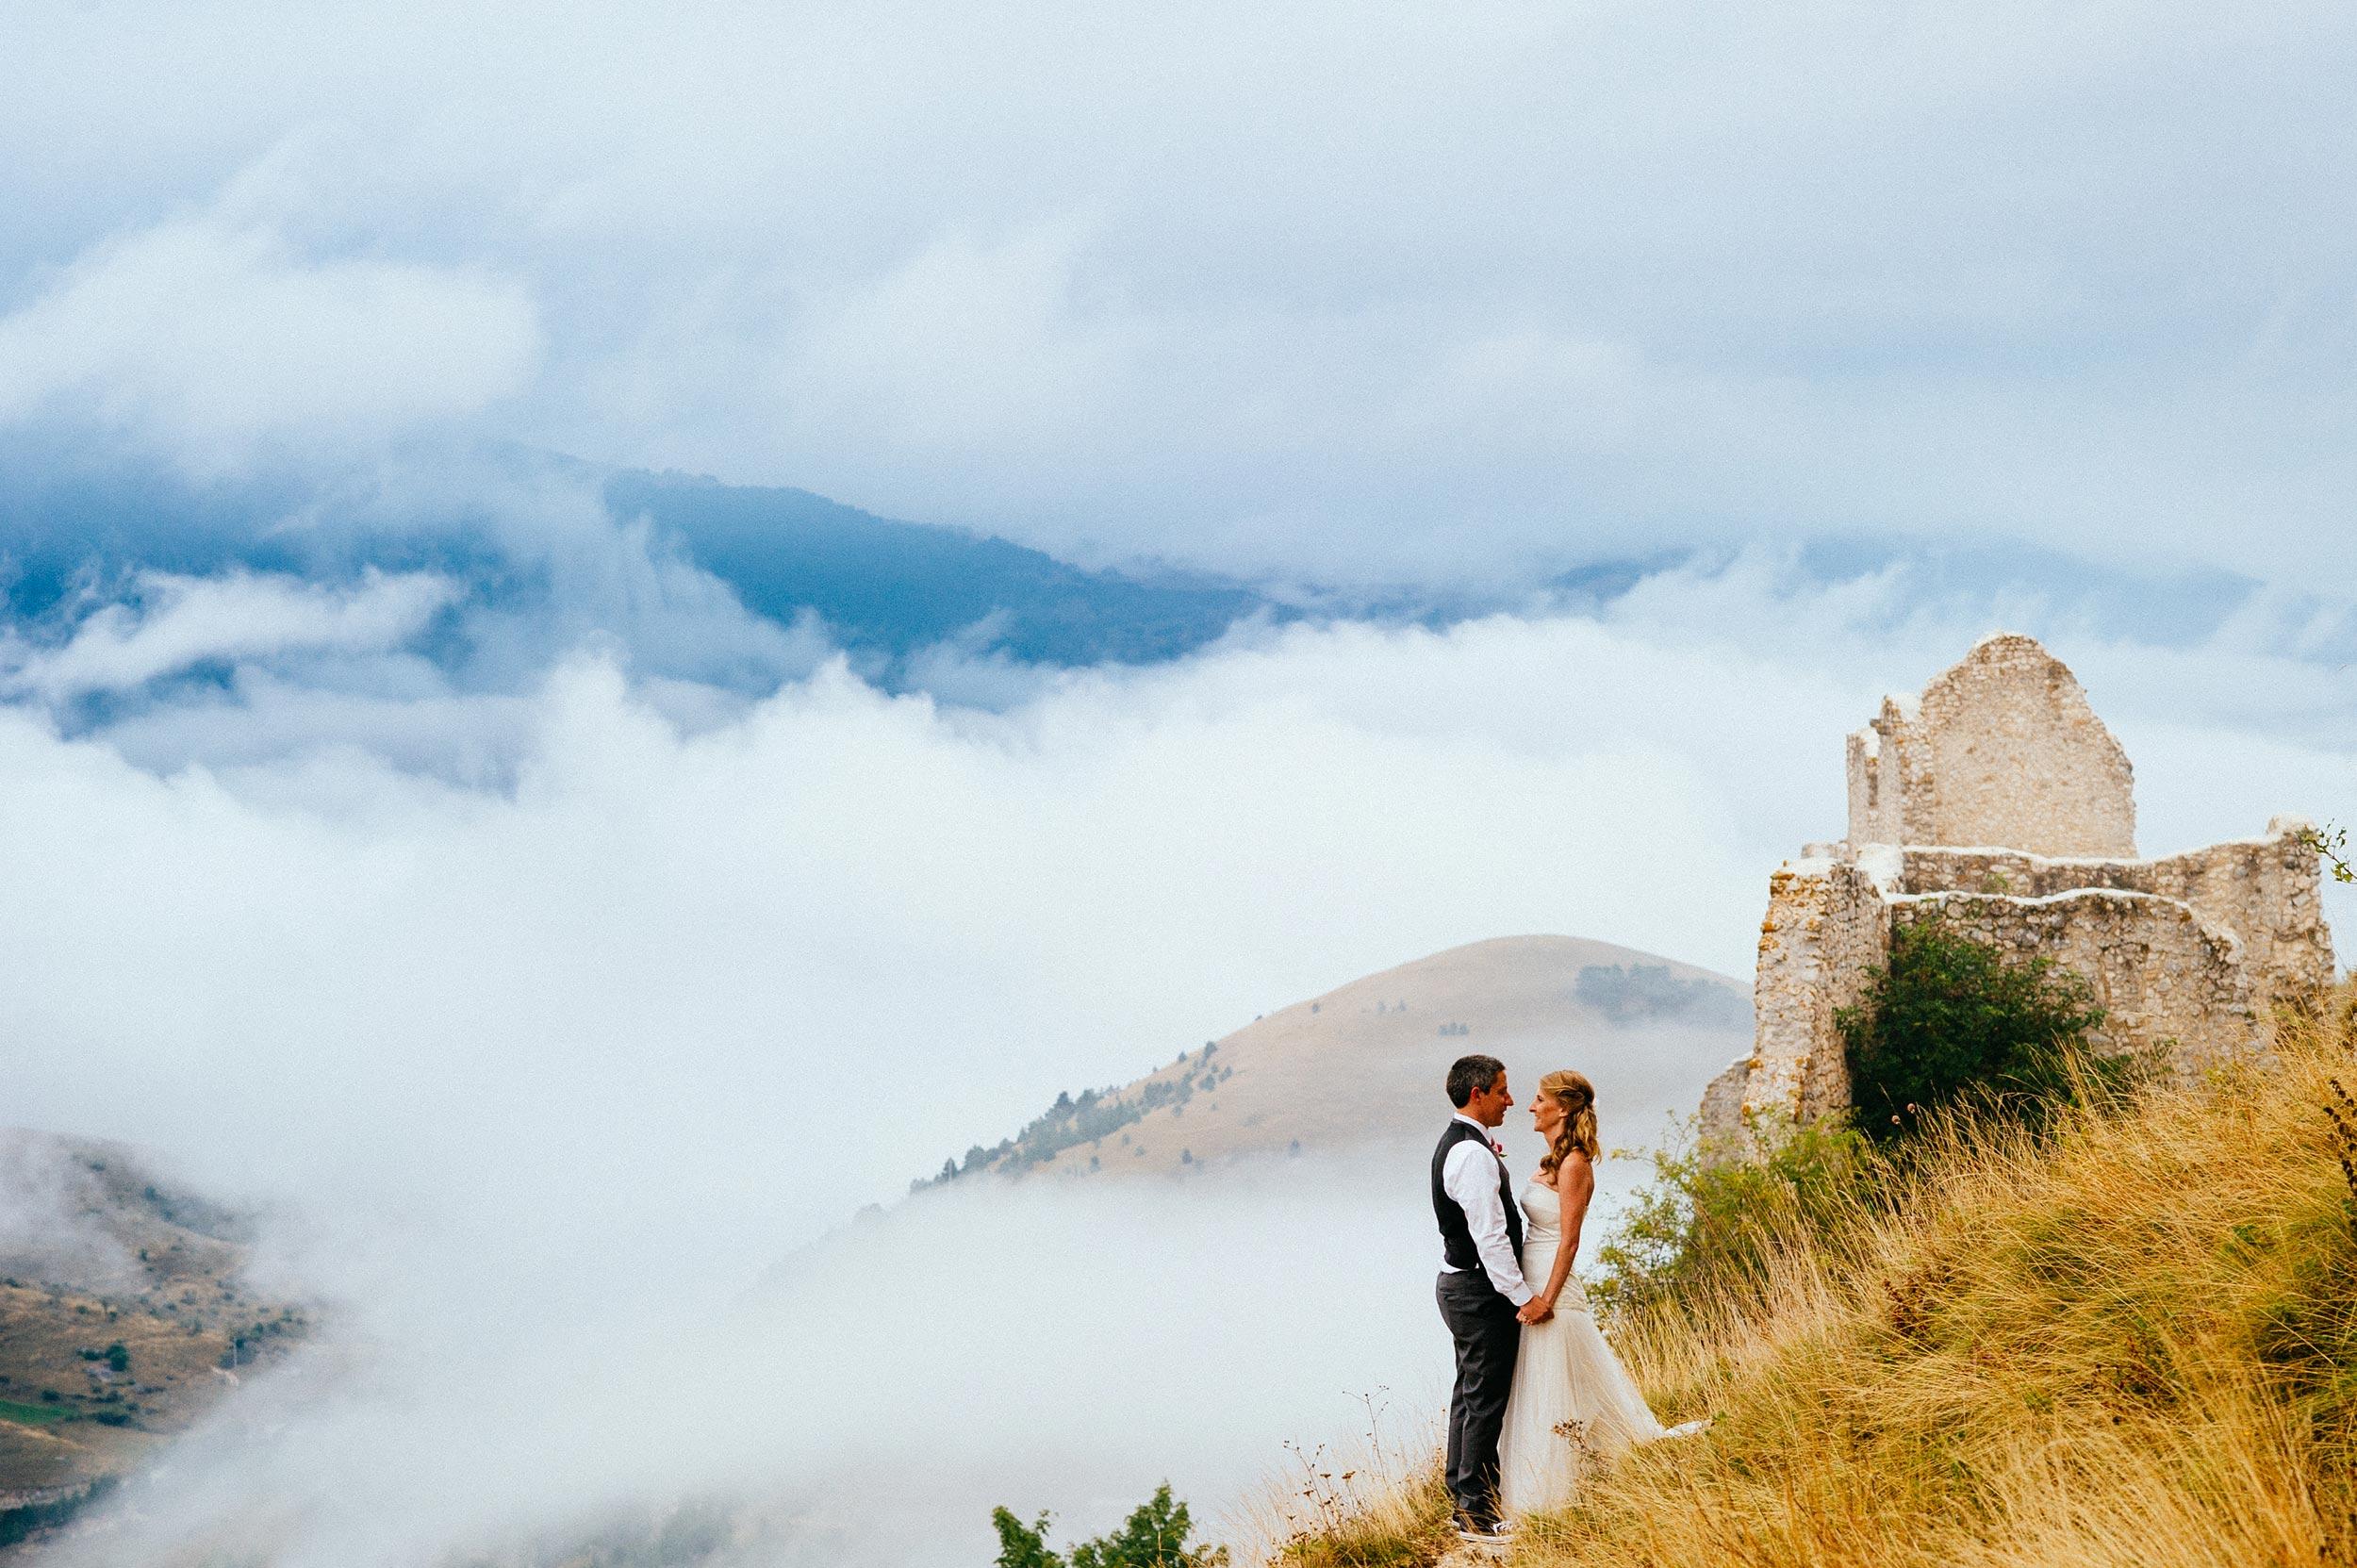 2014-Shelby-Jocelyn-Santo-Stefano-Di-Sessanio-Wedding-Photographer-Italy-Alessandro-Avenali-36.jpg